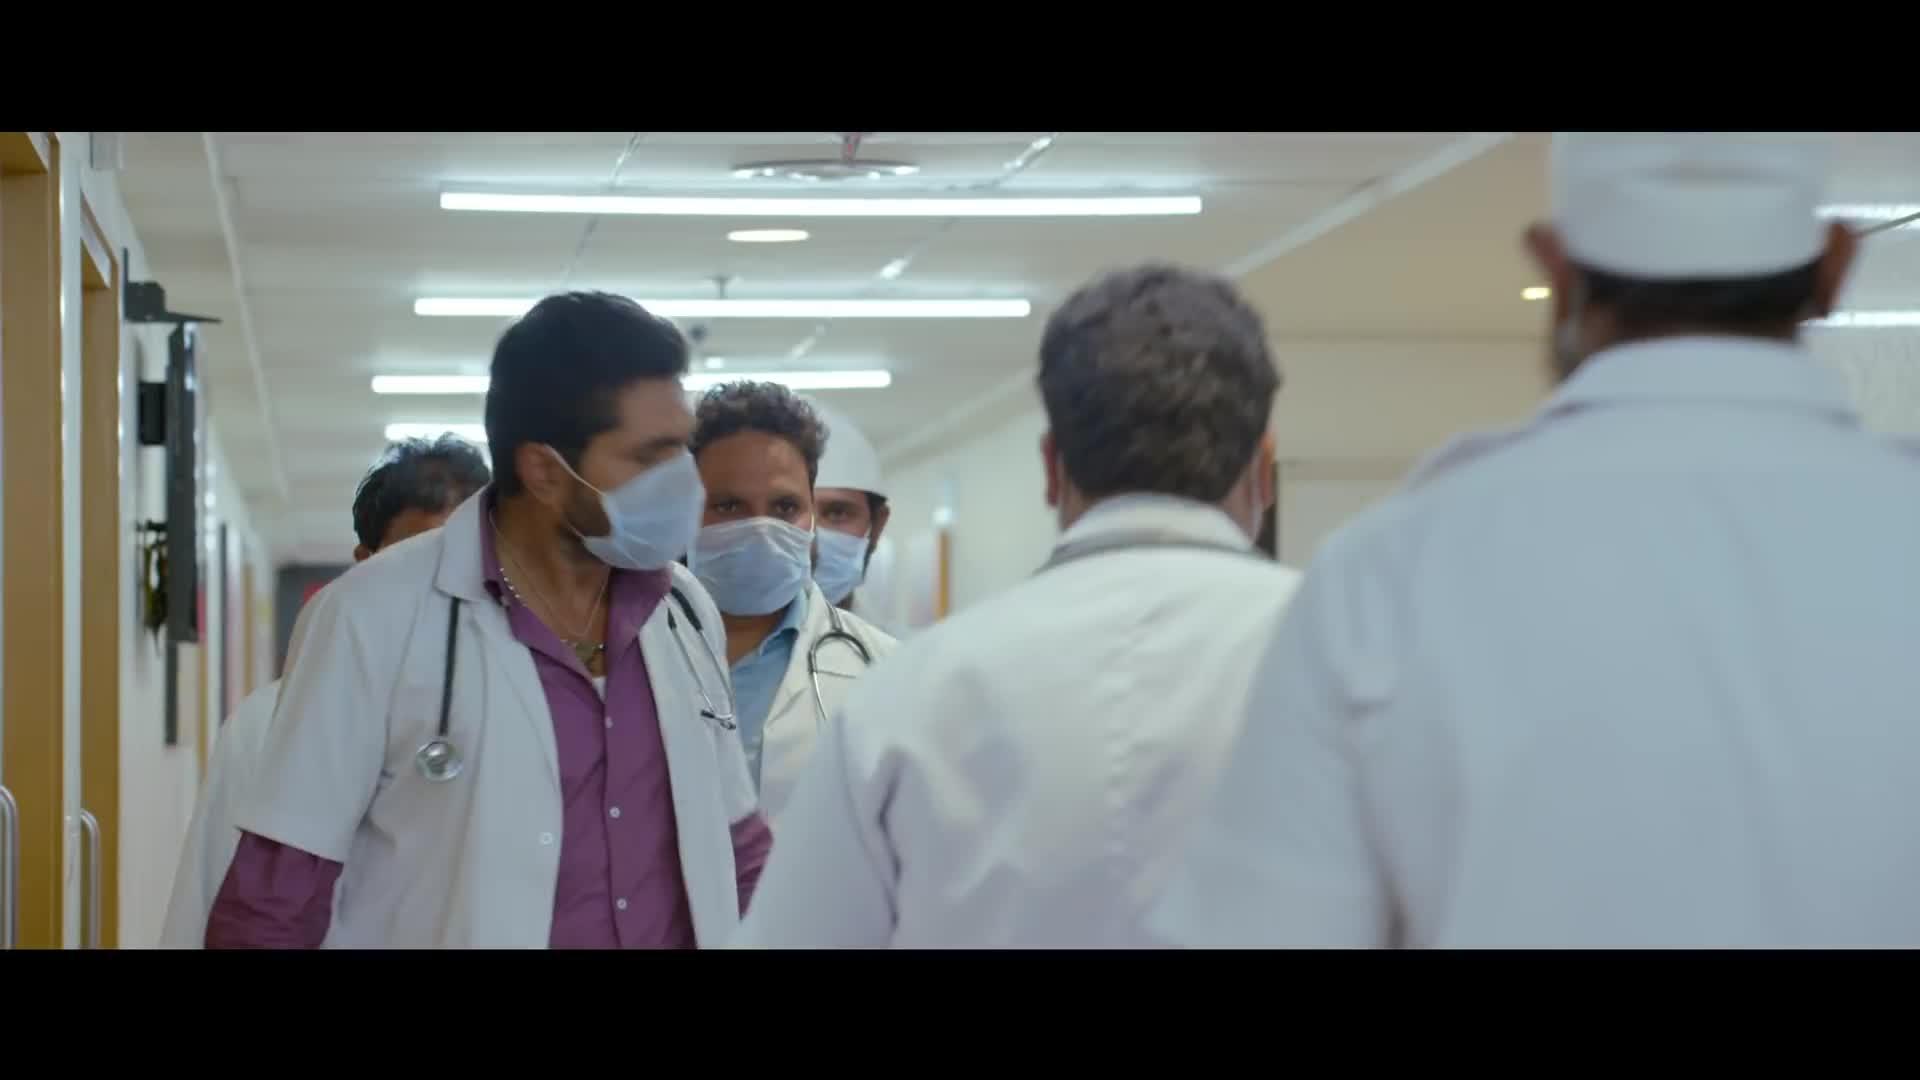 Silly Fellows (2018) Trailer